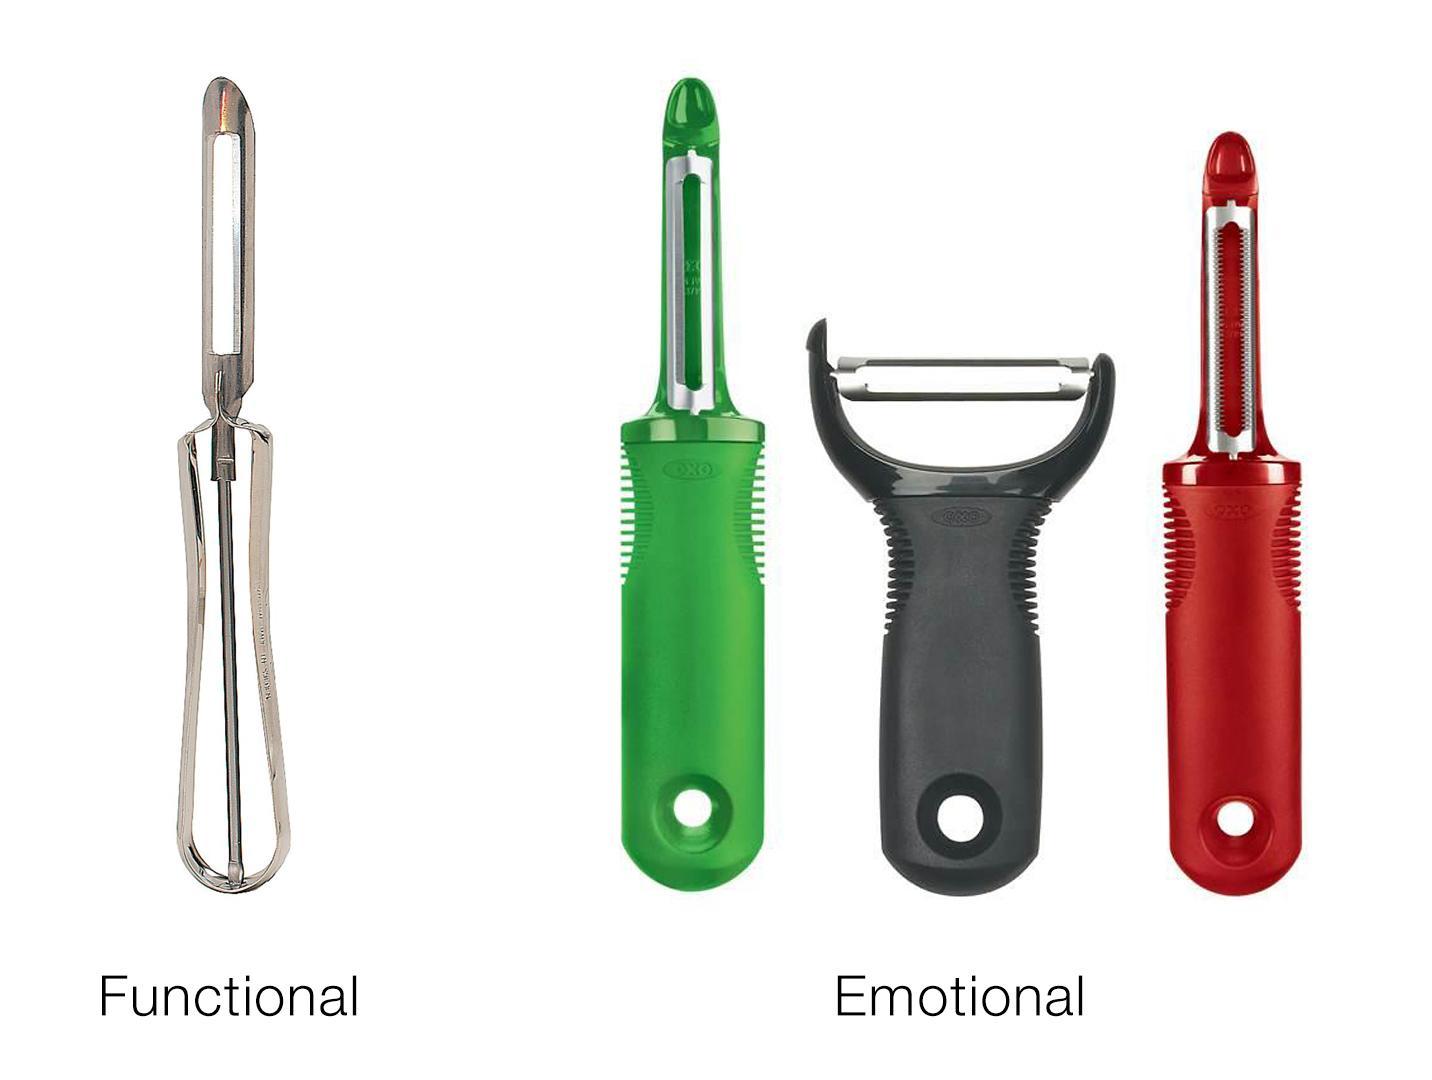 Functional vs emotional design